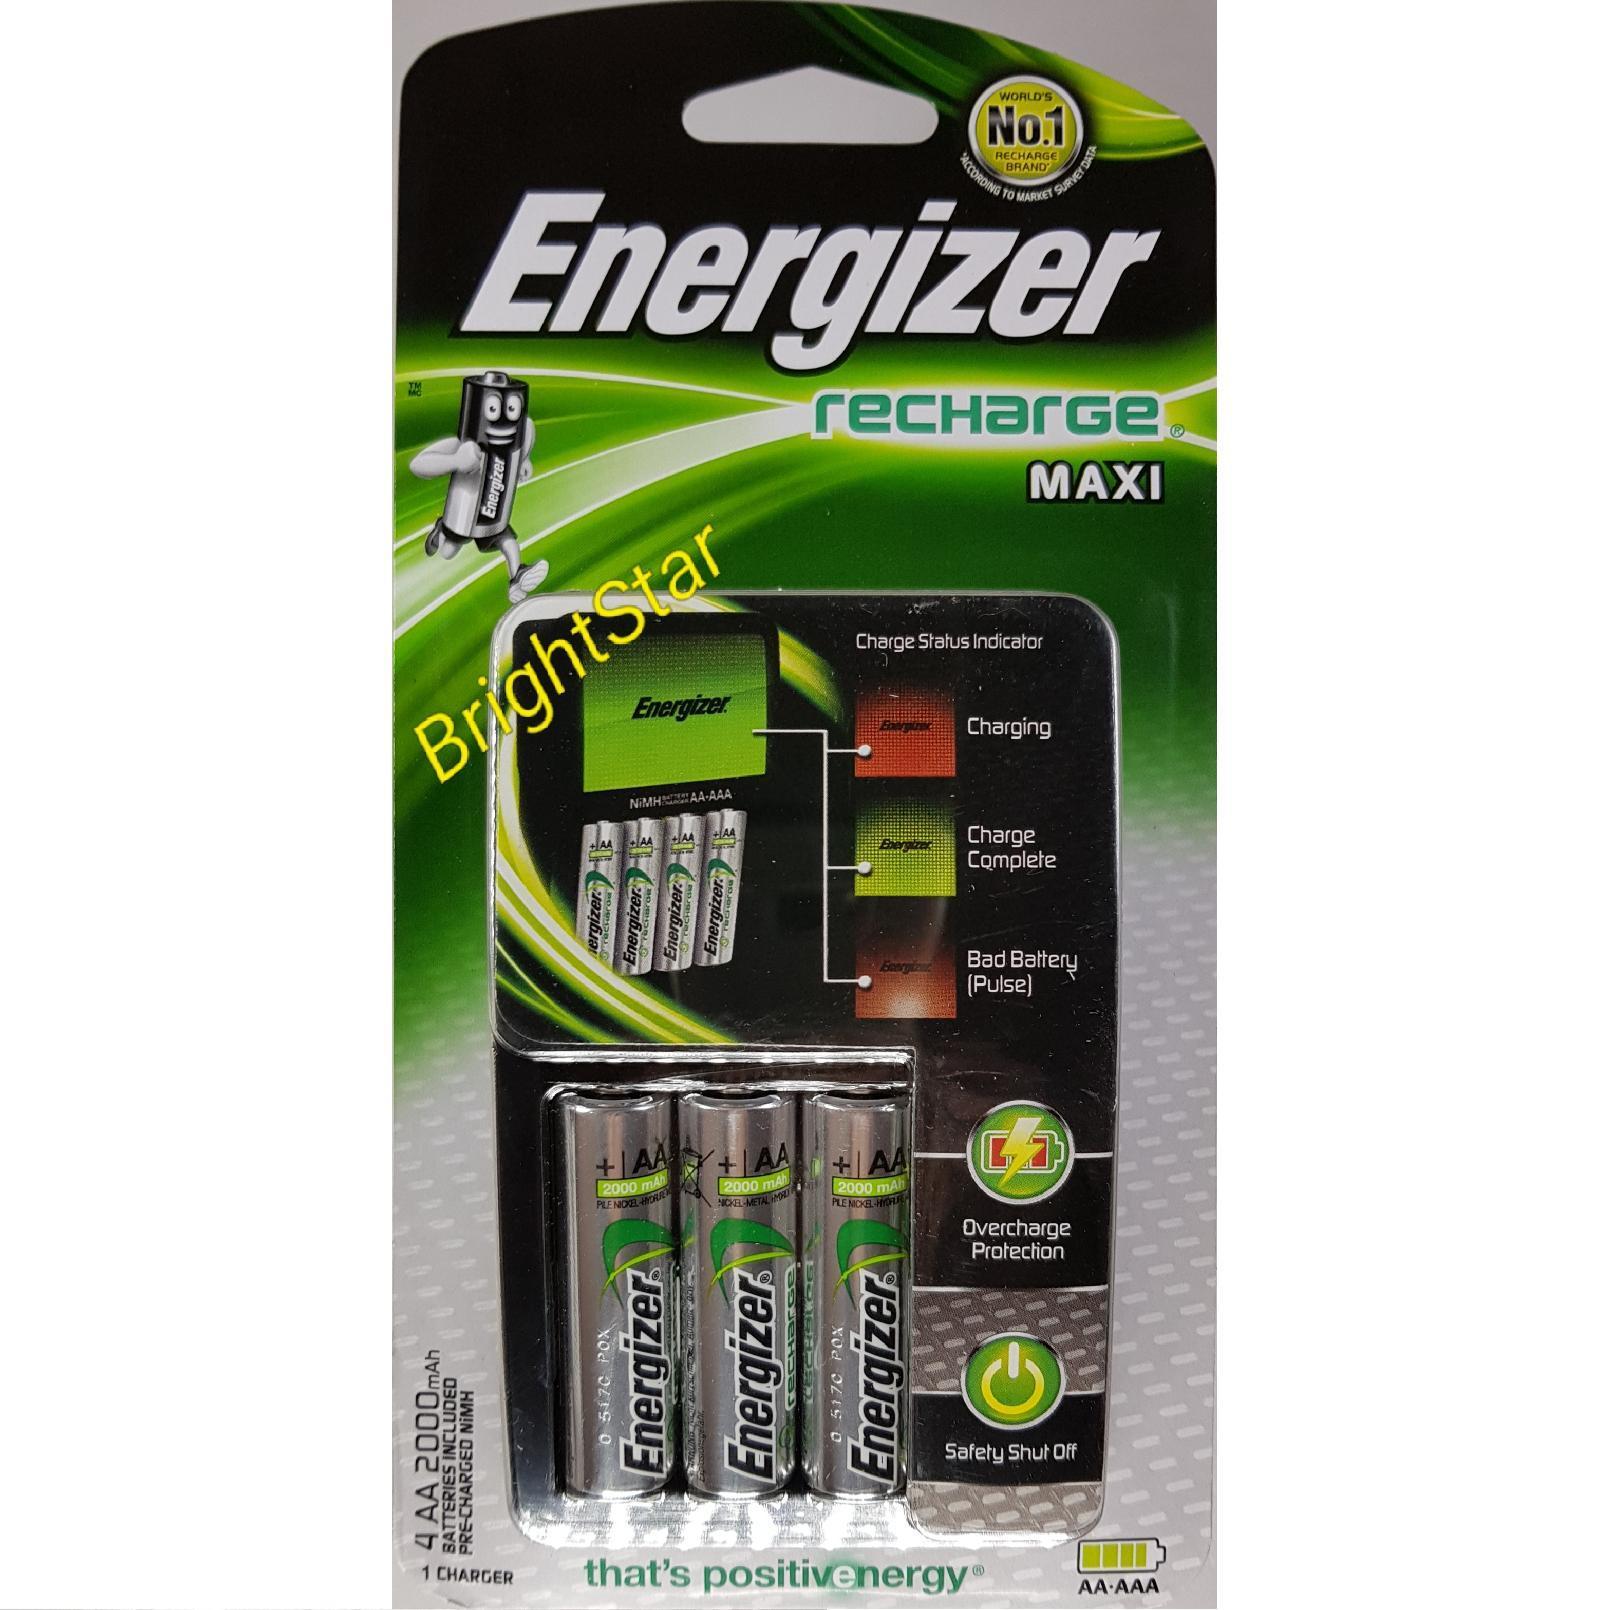 ENERGIZER RECHARGE MAXI (CHVCM4) + 4 AA 2000 mAh BATERAI RECHARGE [Charger Baterai / Cas Baterai En